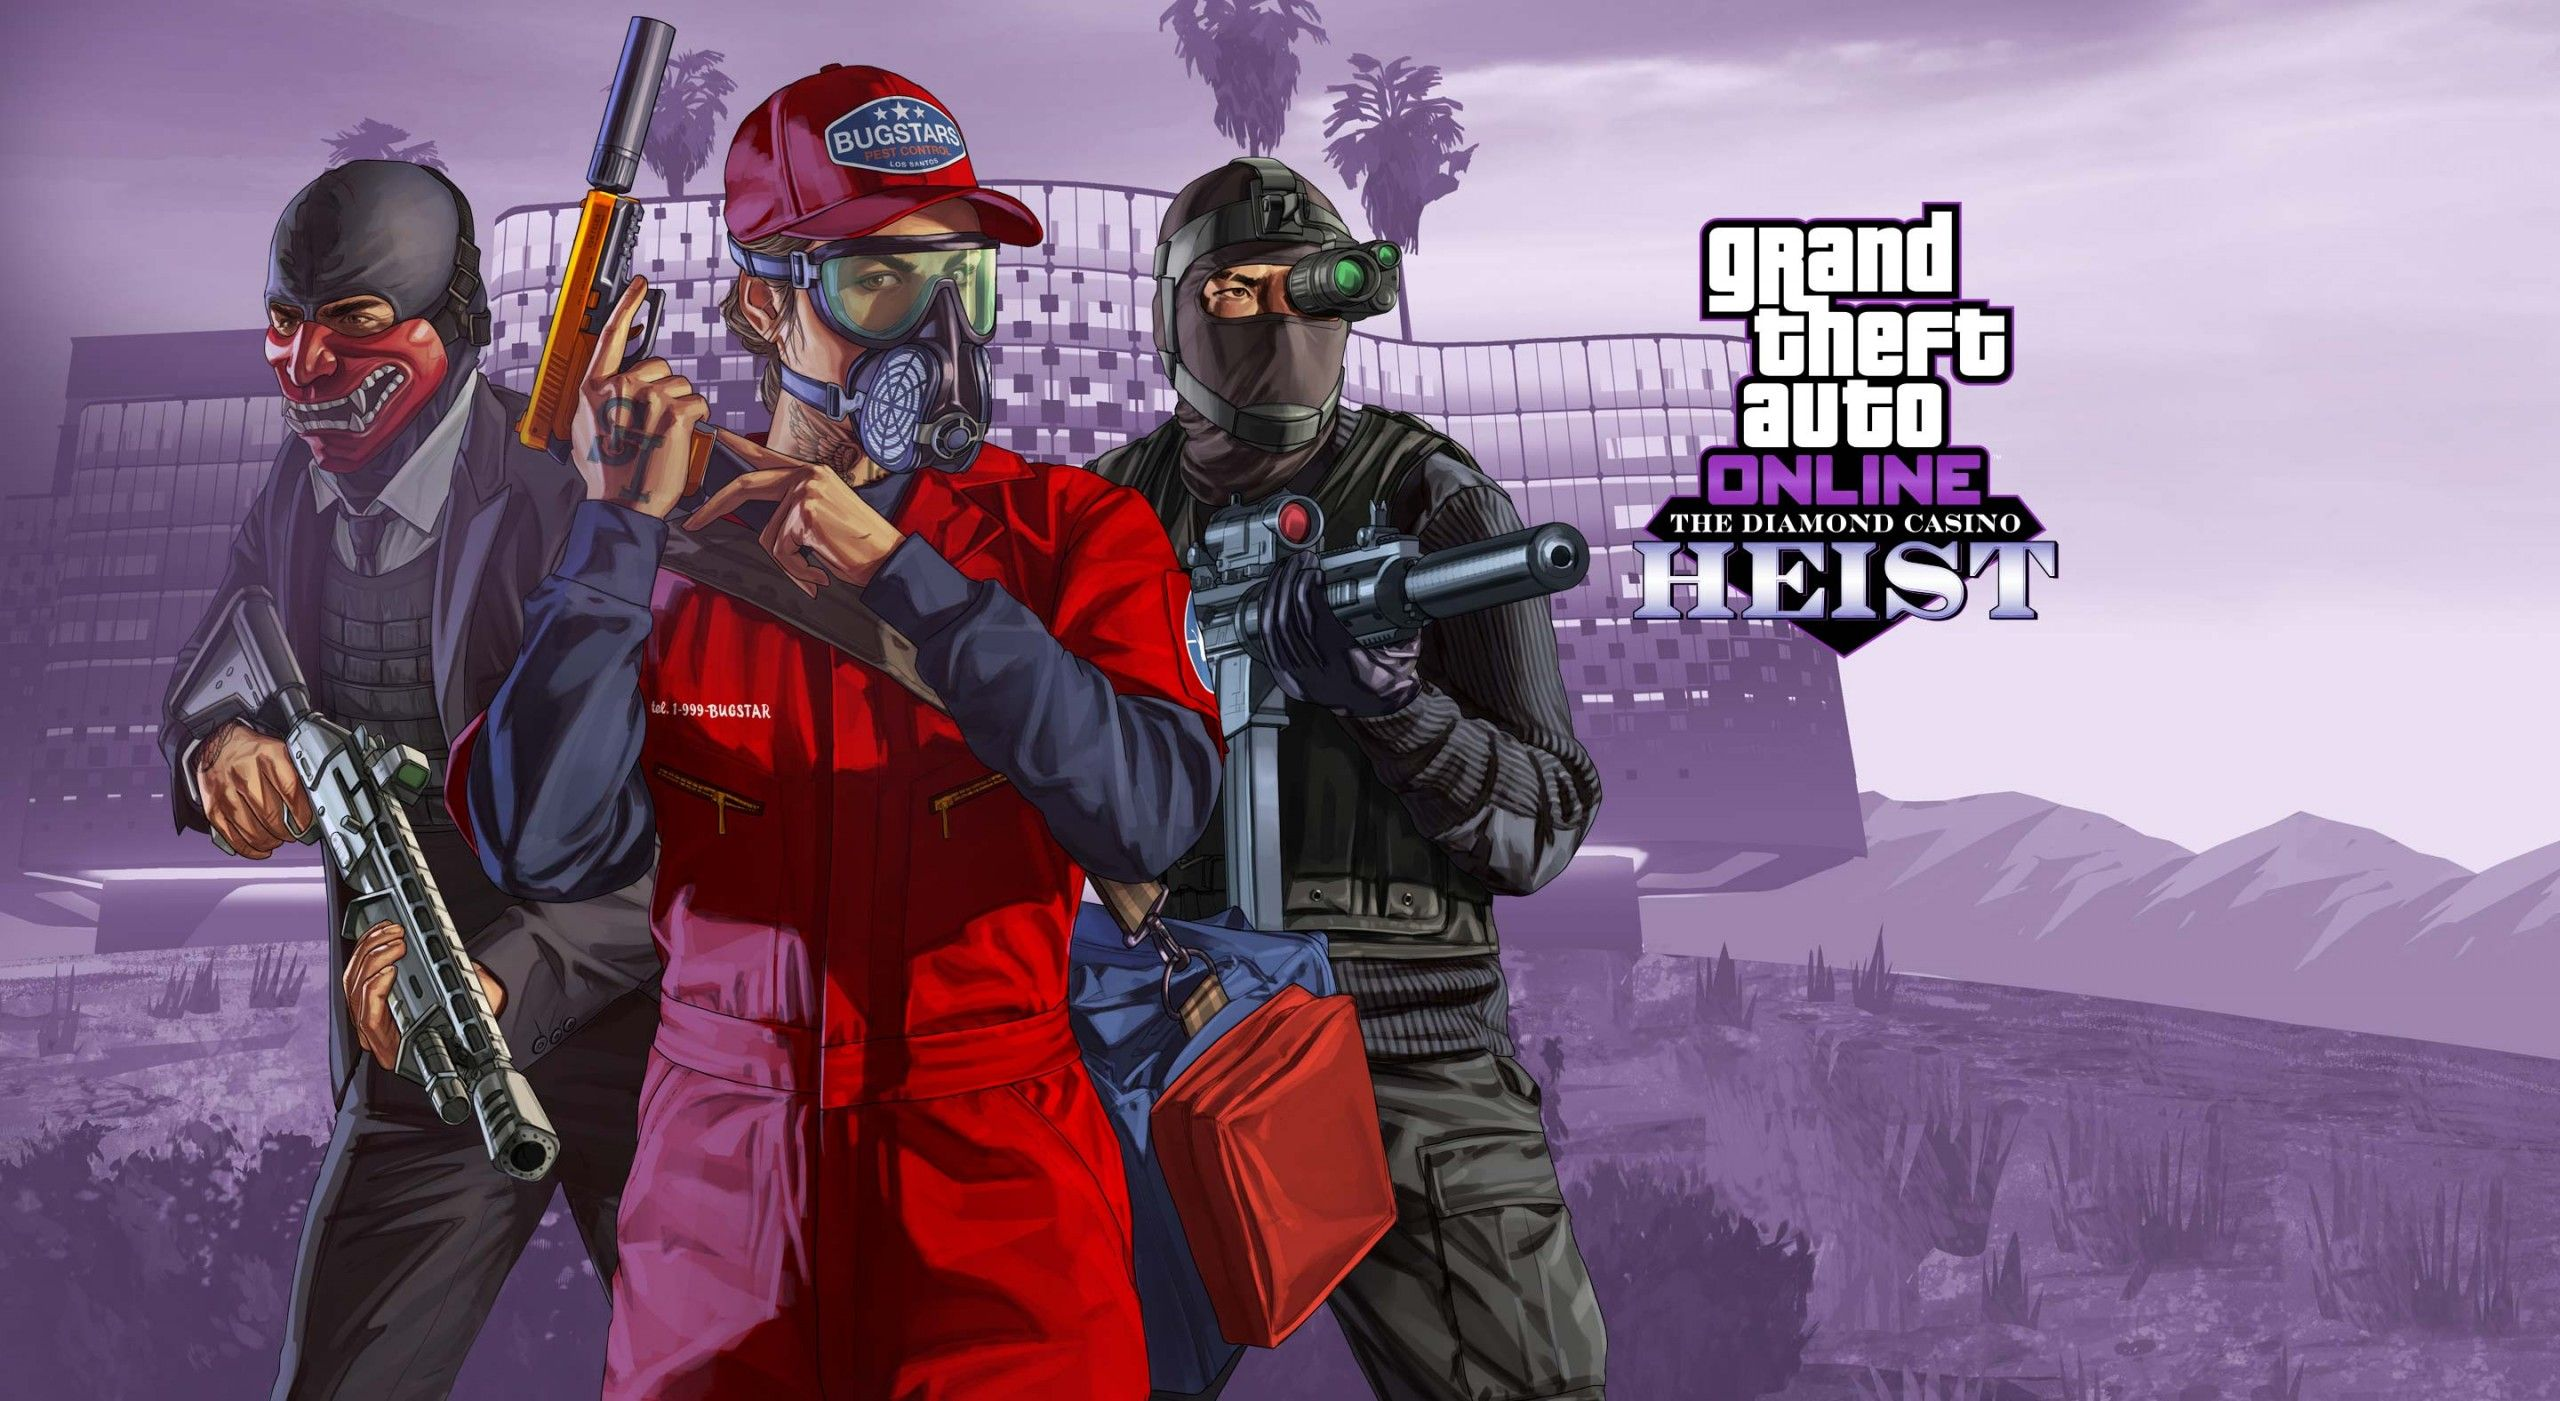 Gta V Artwork Gtaonline Lester Gta Online Gta Grand Theft Auto Gta v diamond casion heist wallpaper